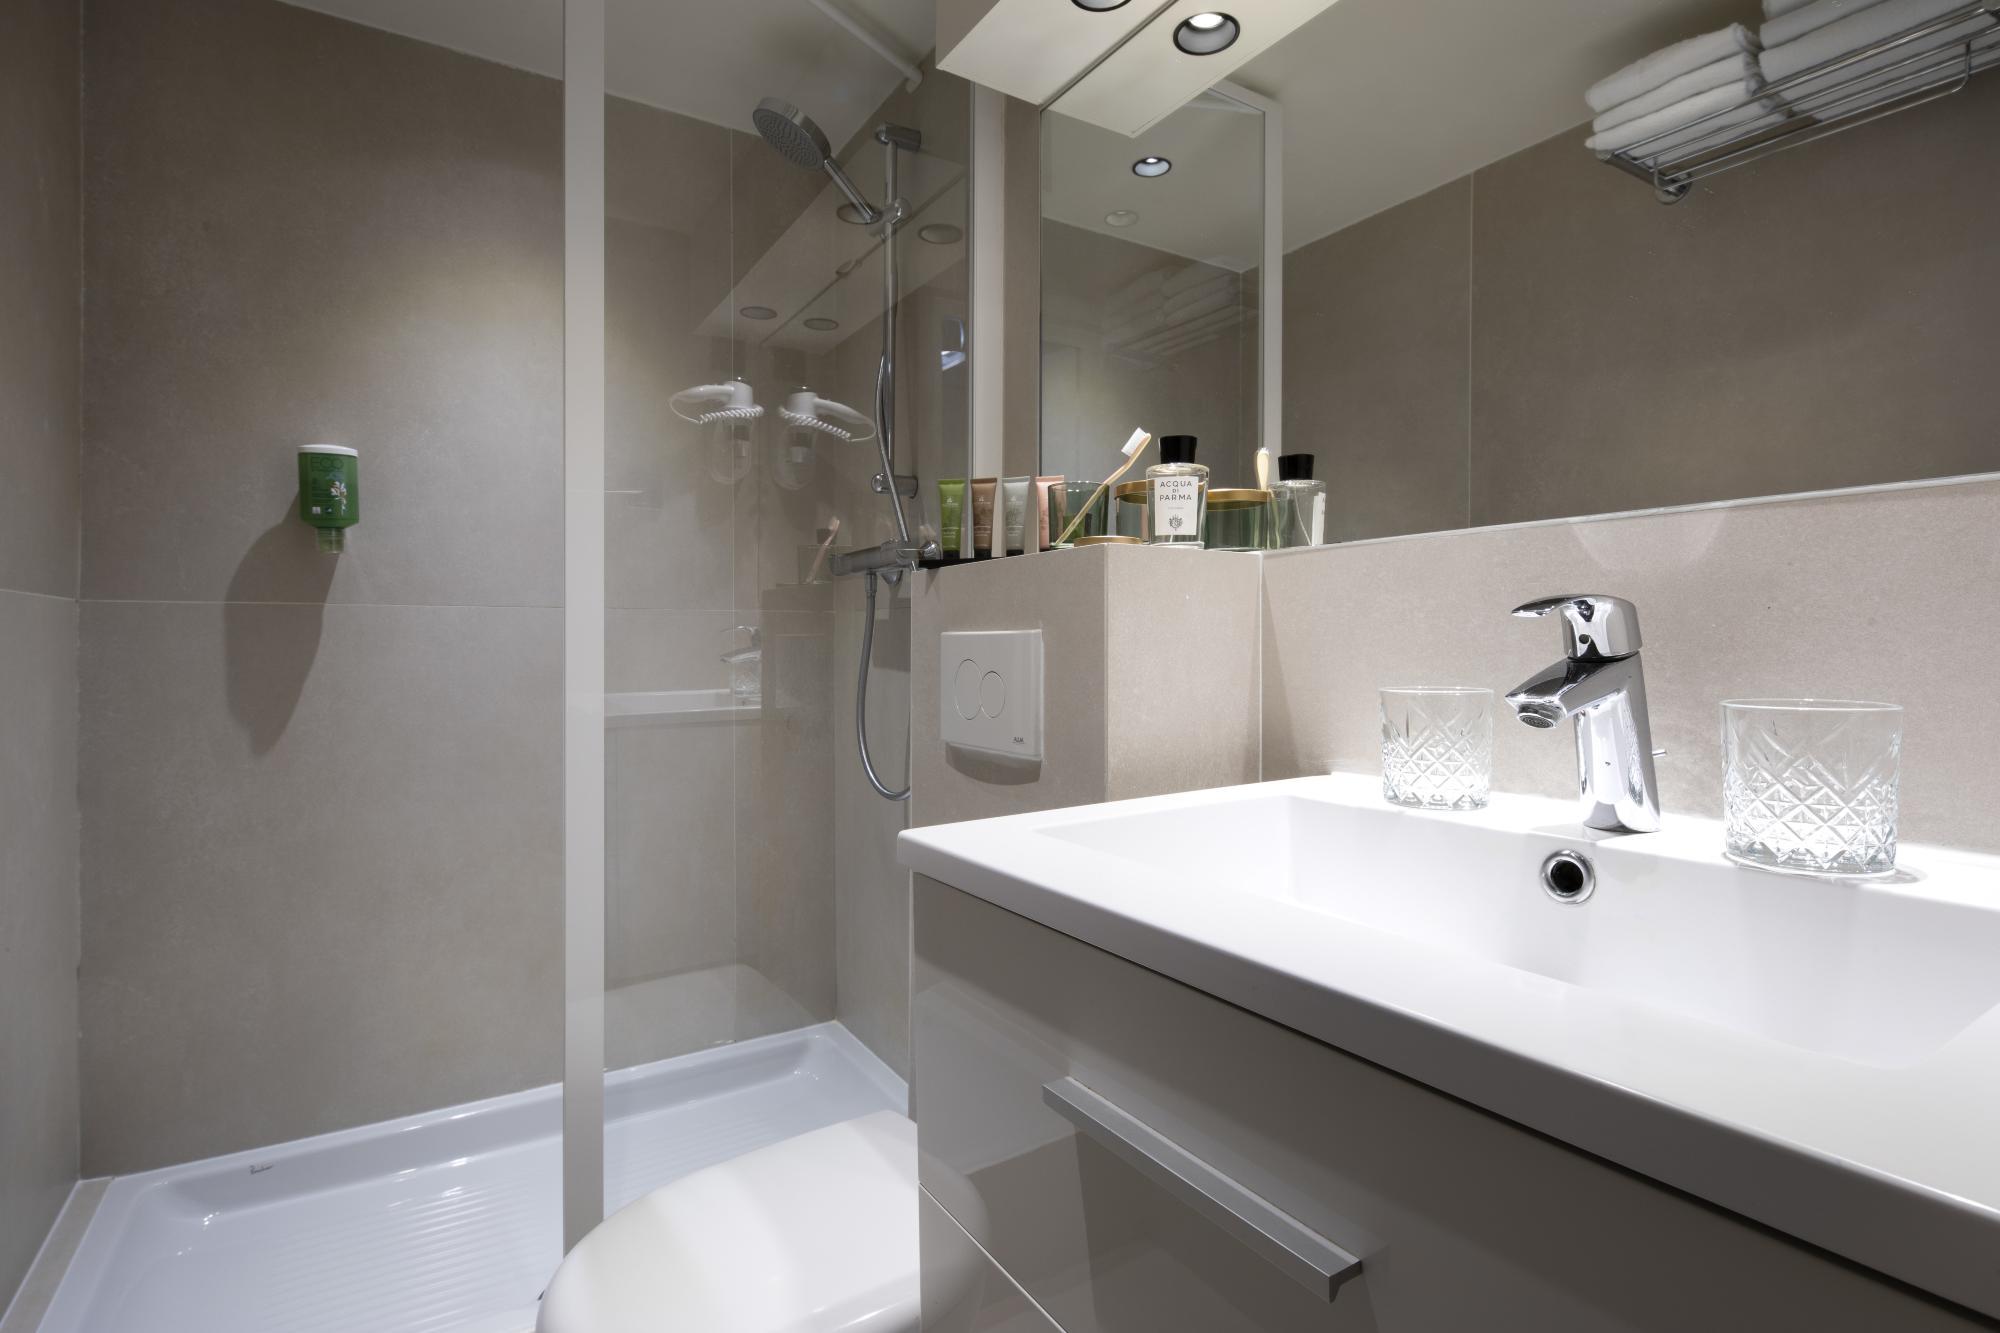 Hotel Brady Deluxe Room Bathroom